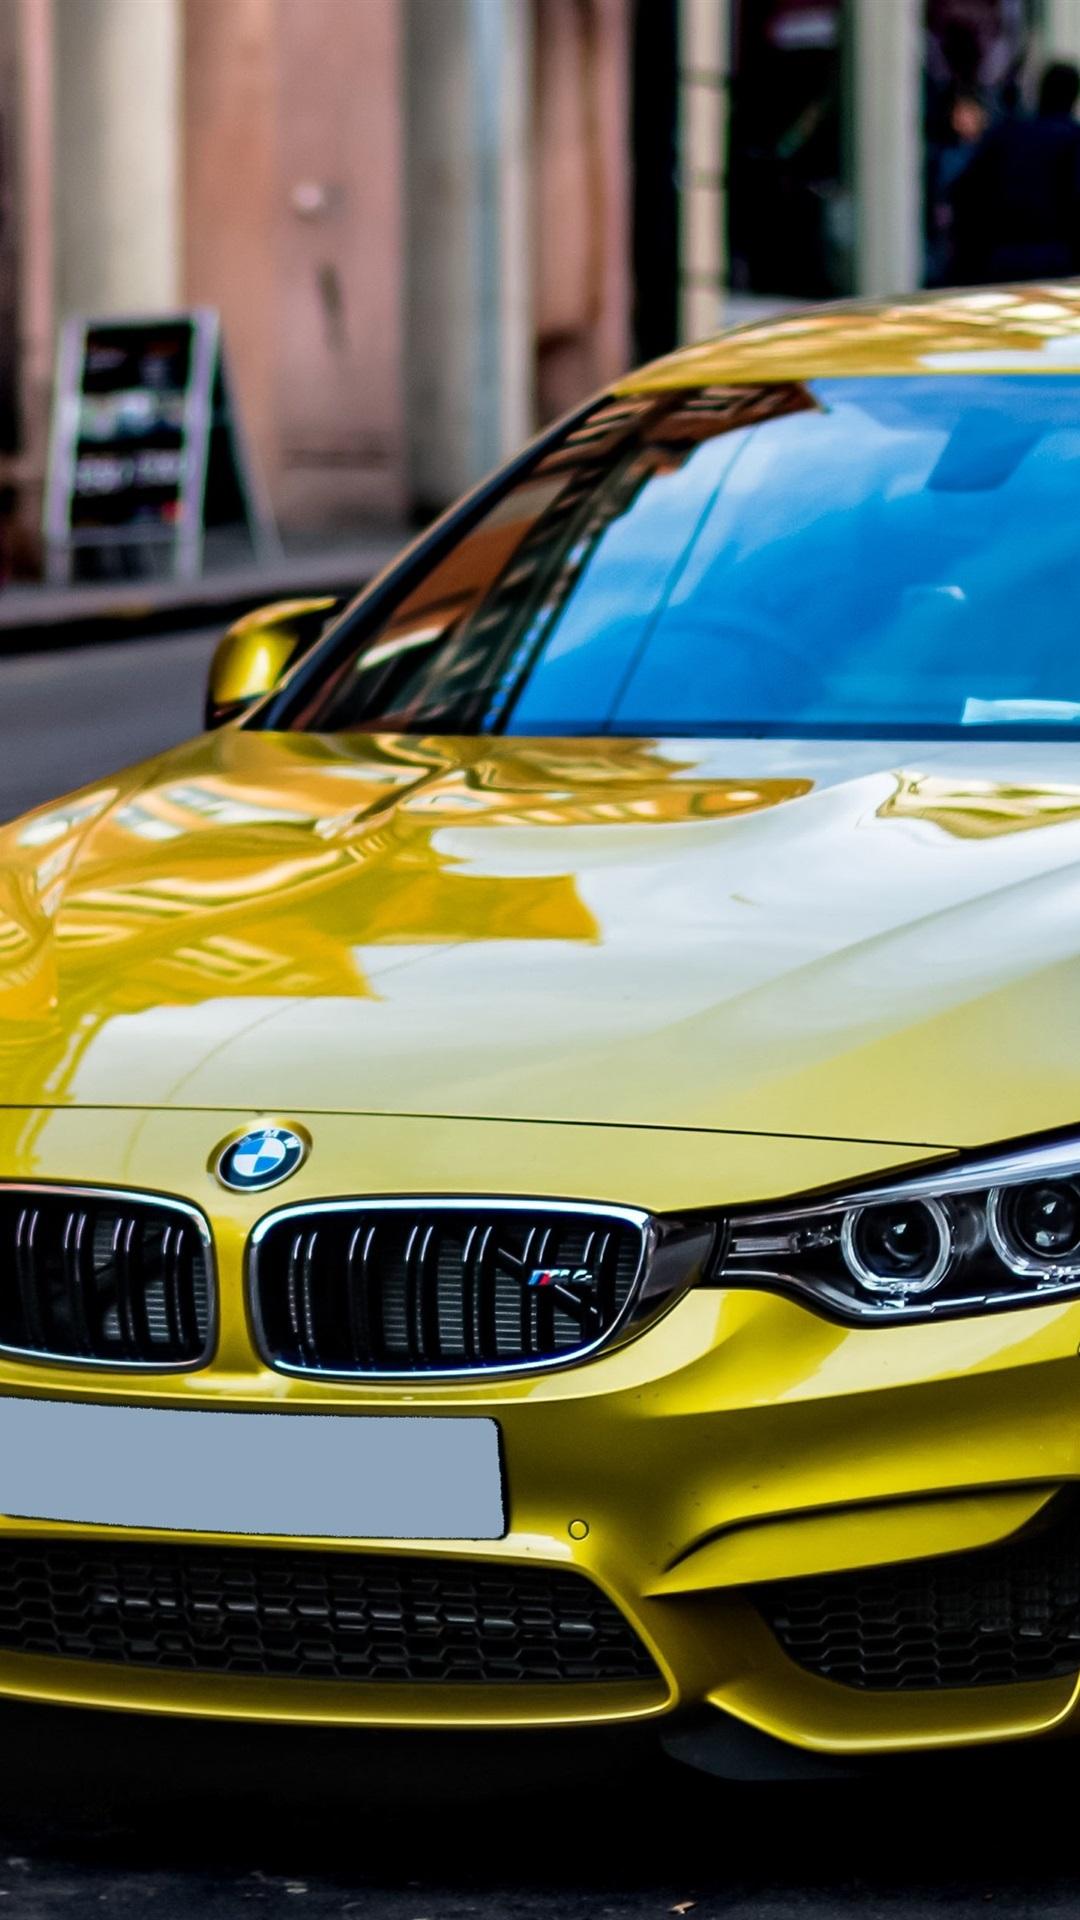 Iphone Wallpaper Yellow Bmw Car Stopped At Street Side Bmw M4 1080x1920 Download Hd Wallpaper Wallpapertip